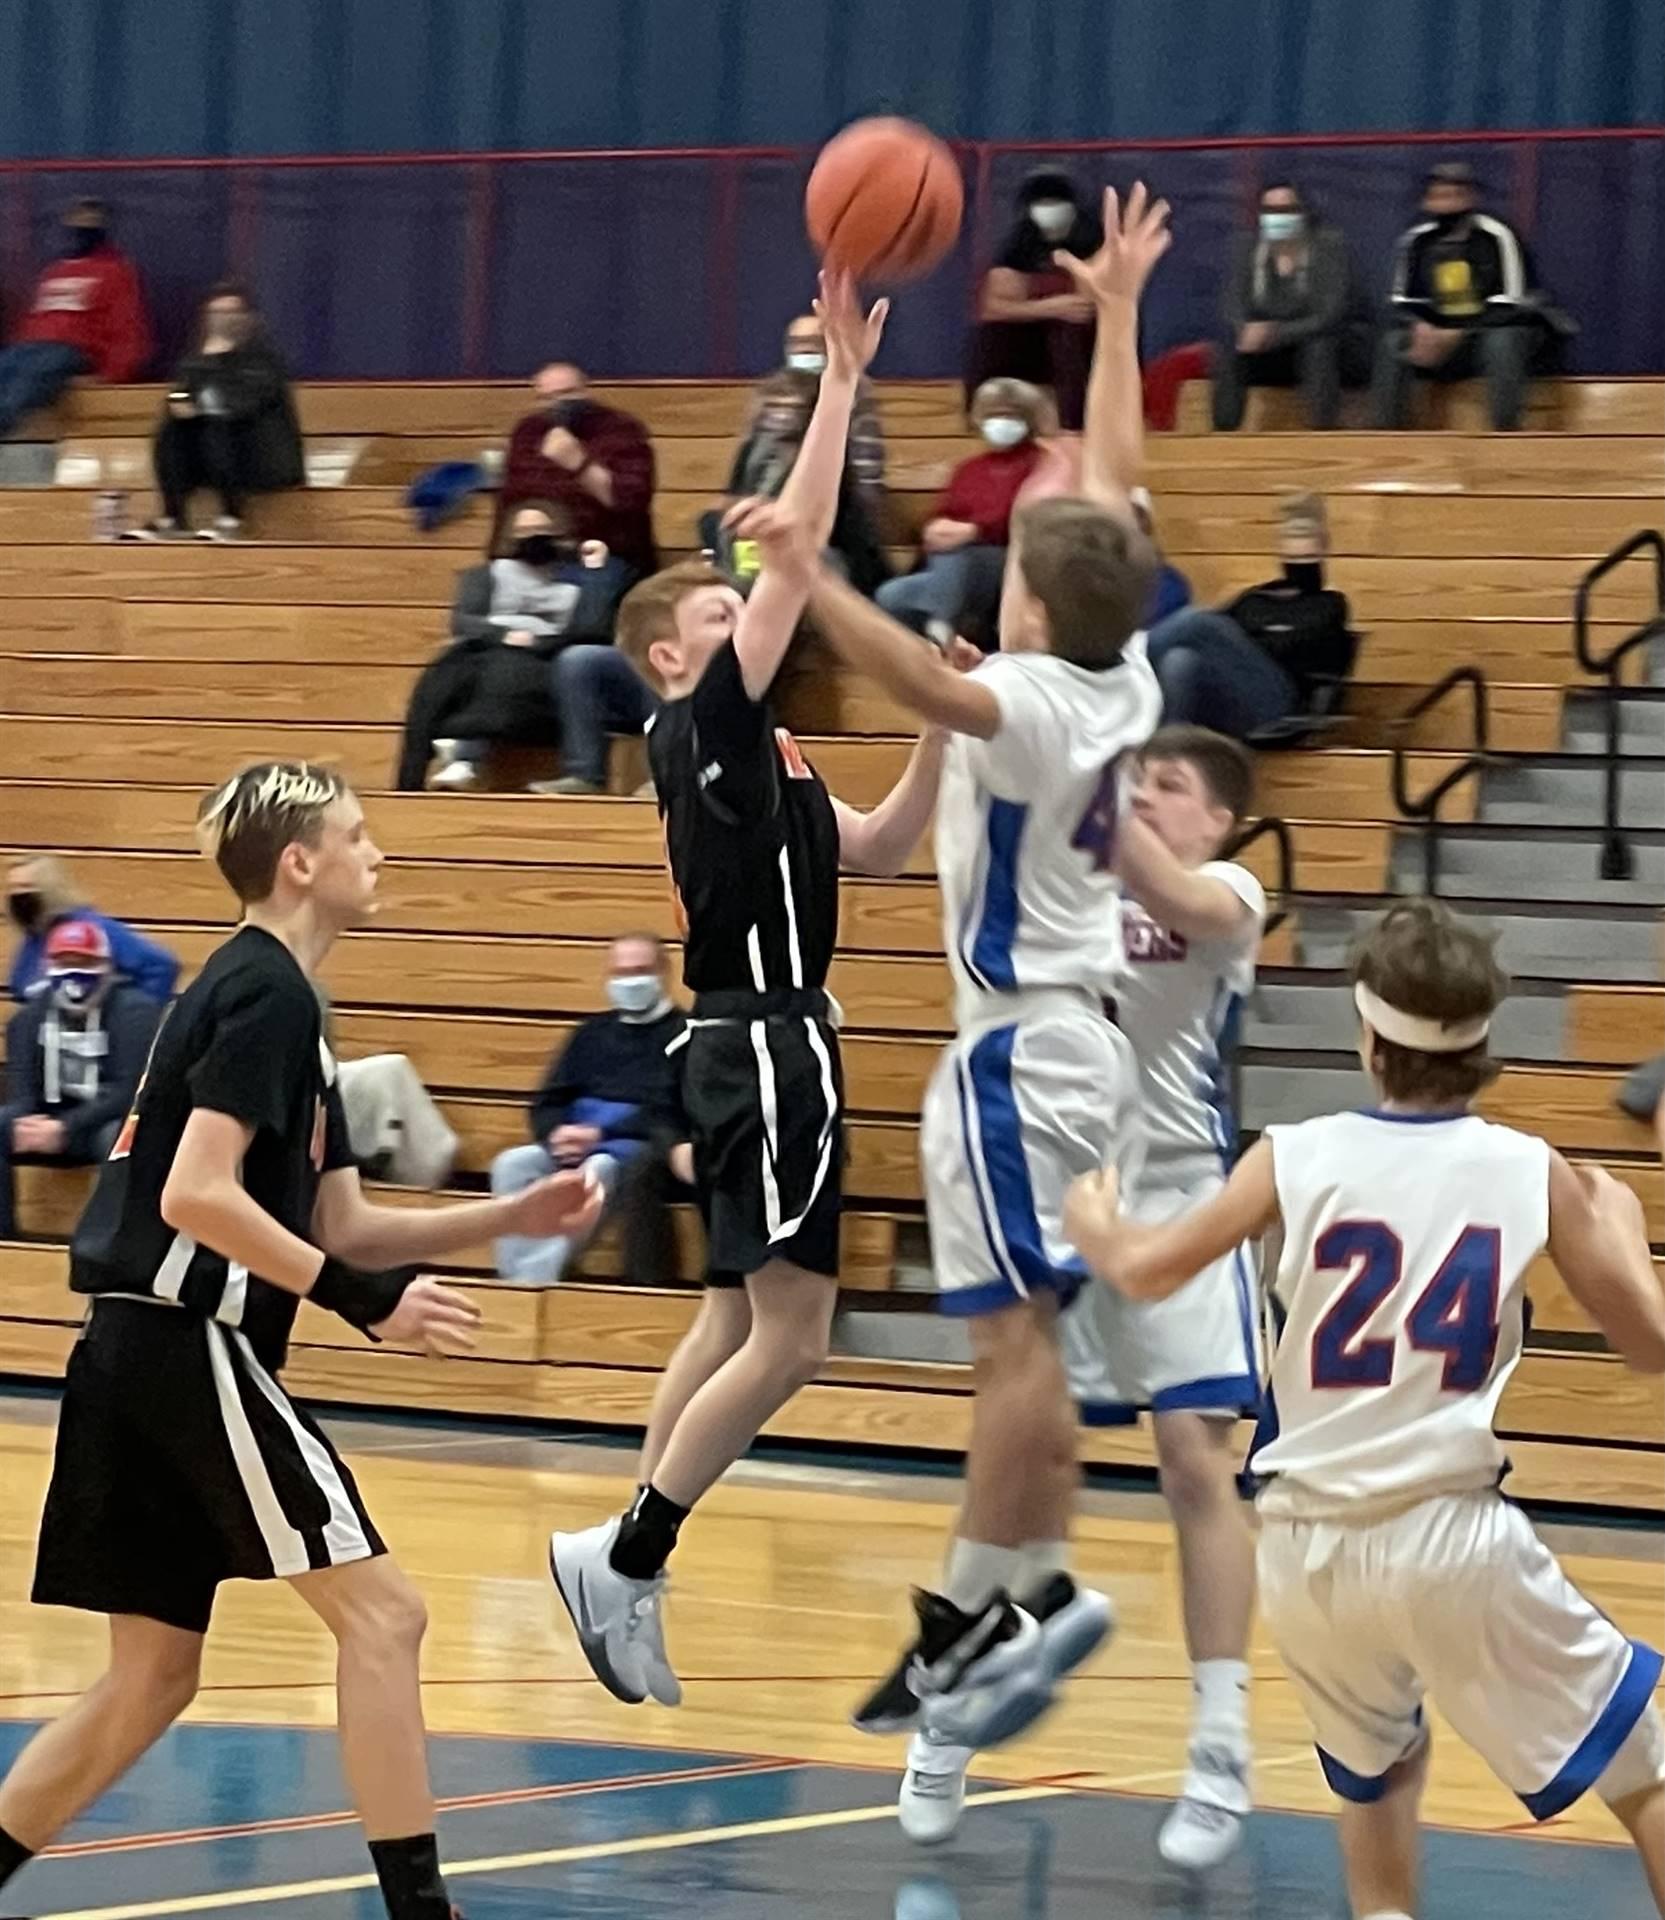 Freshman Basketball taking on Licking Valley